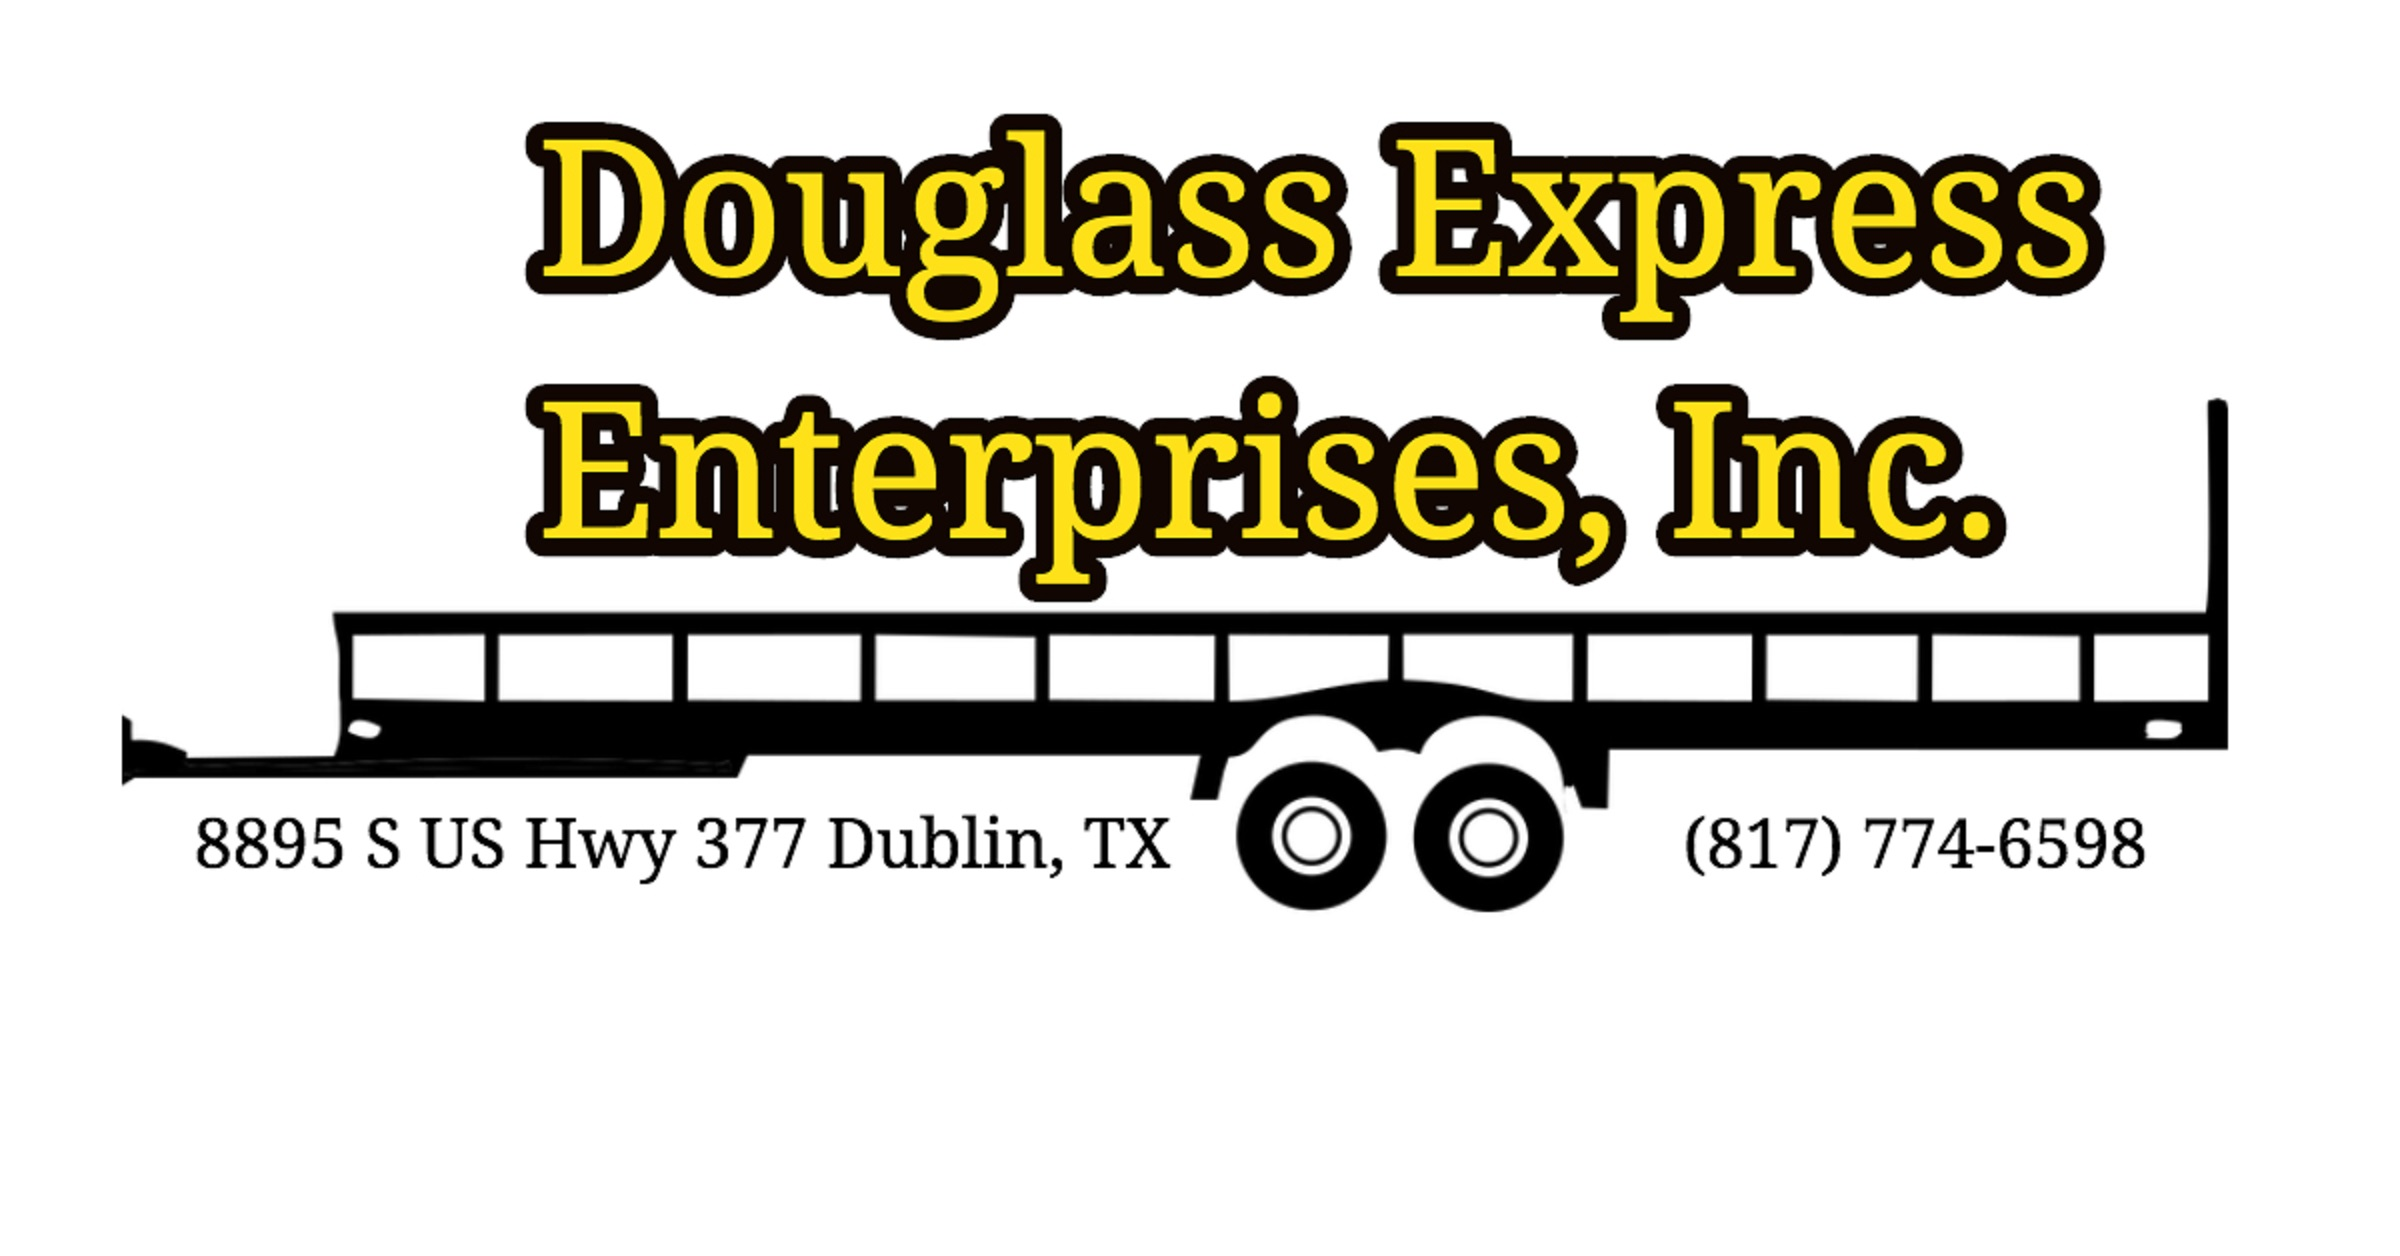 Douglass Express Enterprises, Inc